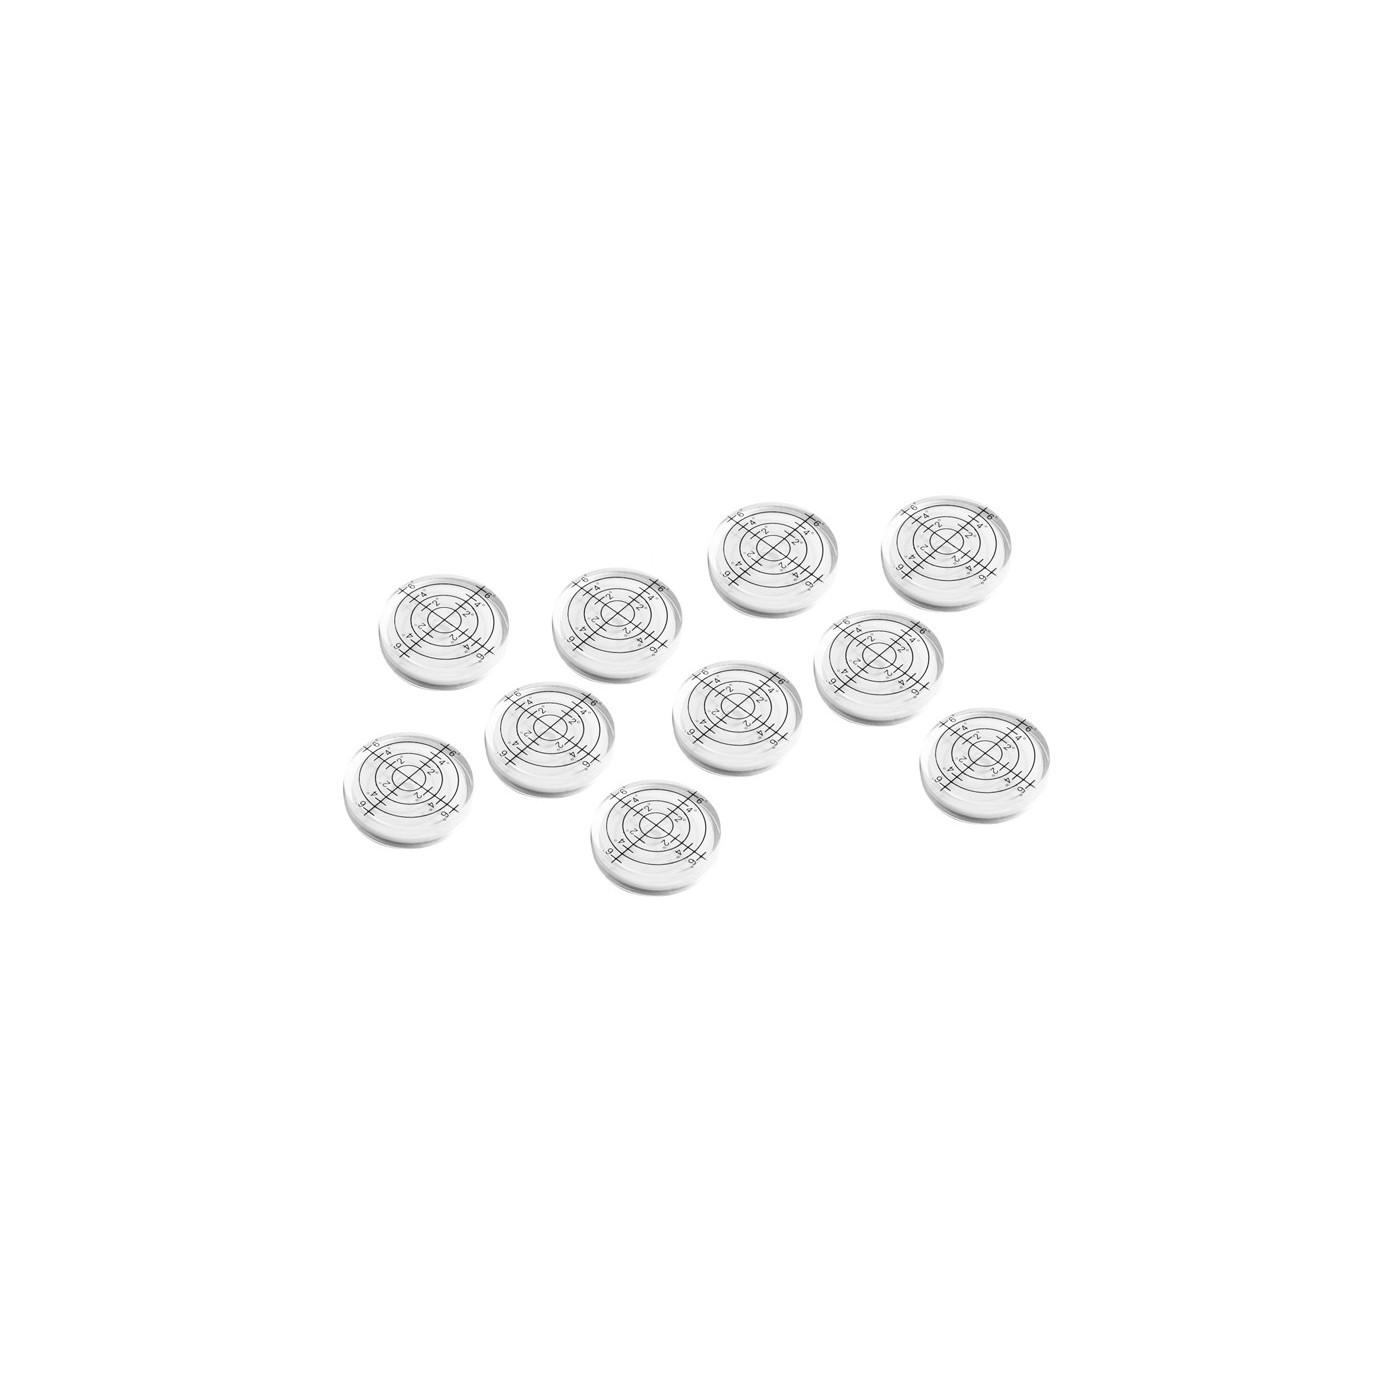 Set of 10 bubble level vials (32x7 mm, white)  - 1